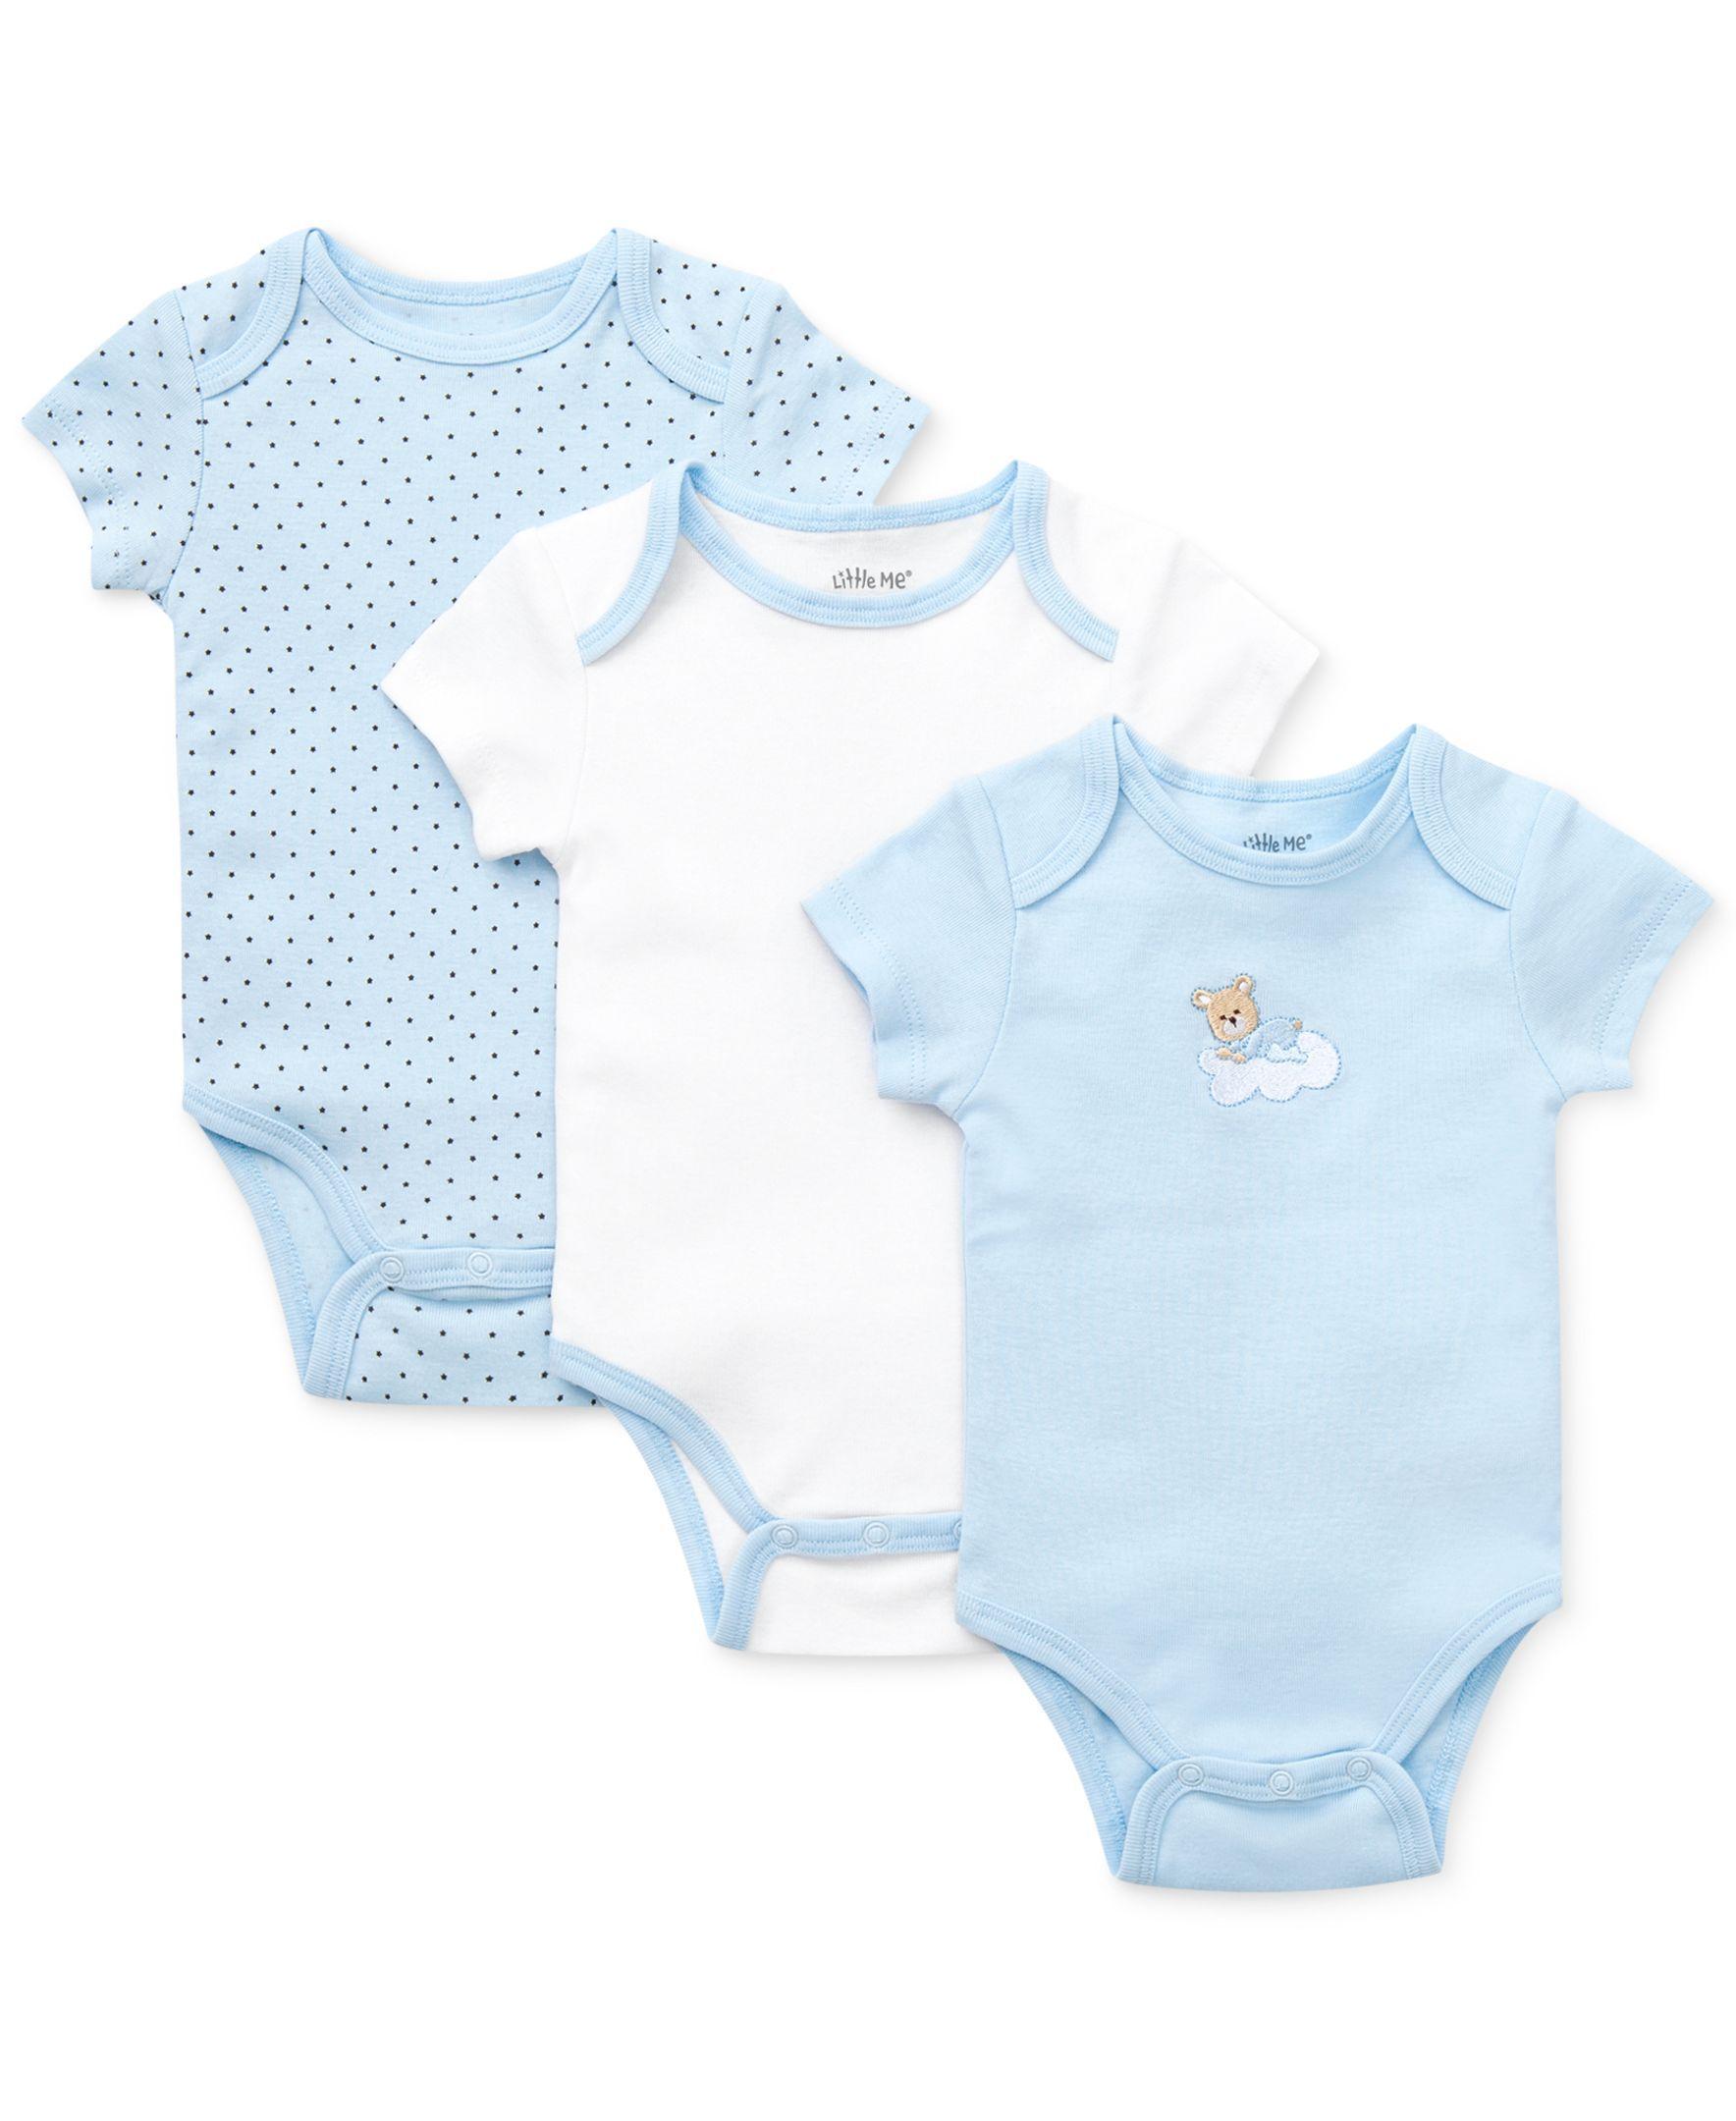 Little Me Baby Boys Sleepy 3 Pack Bodysuits